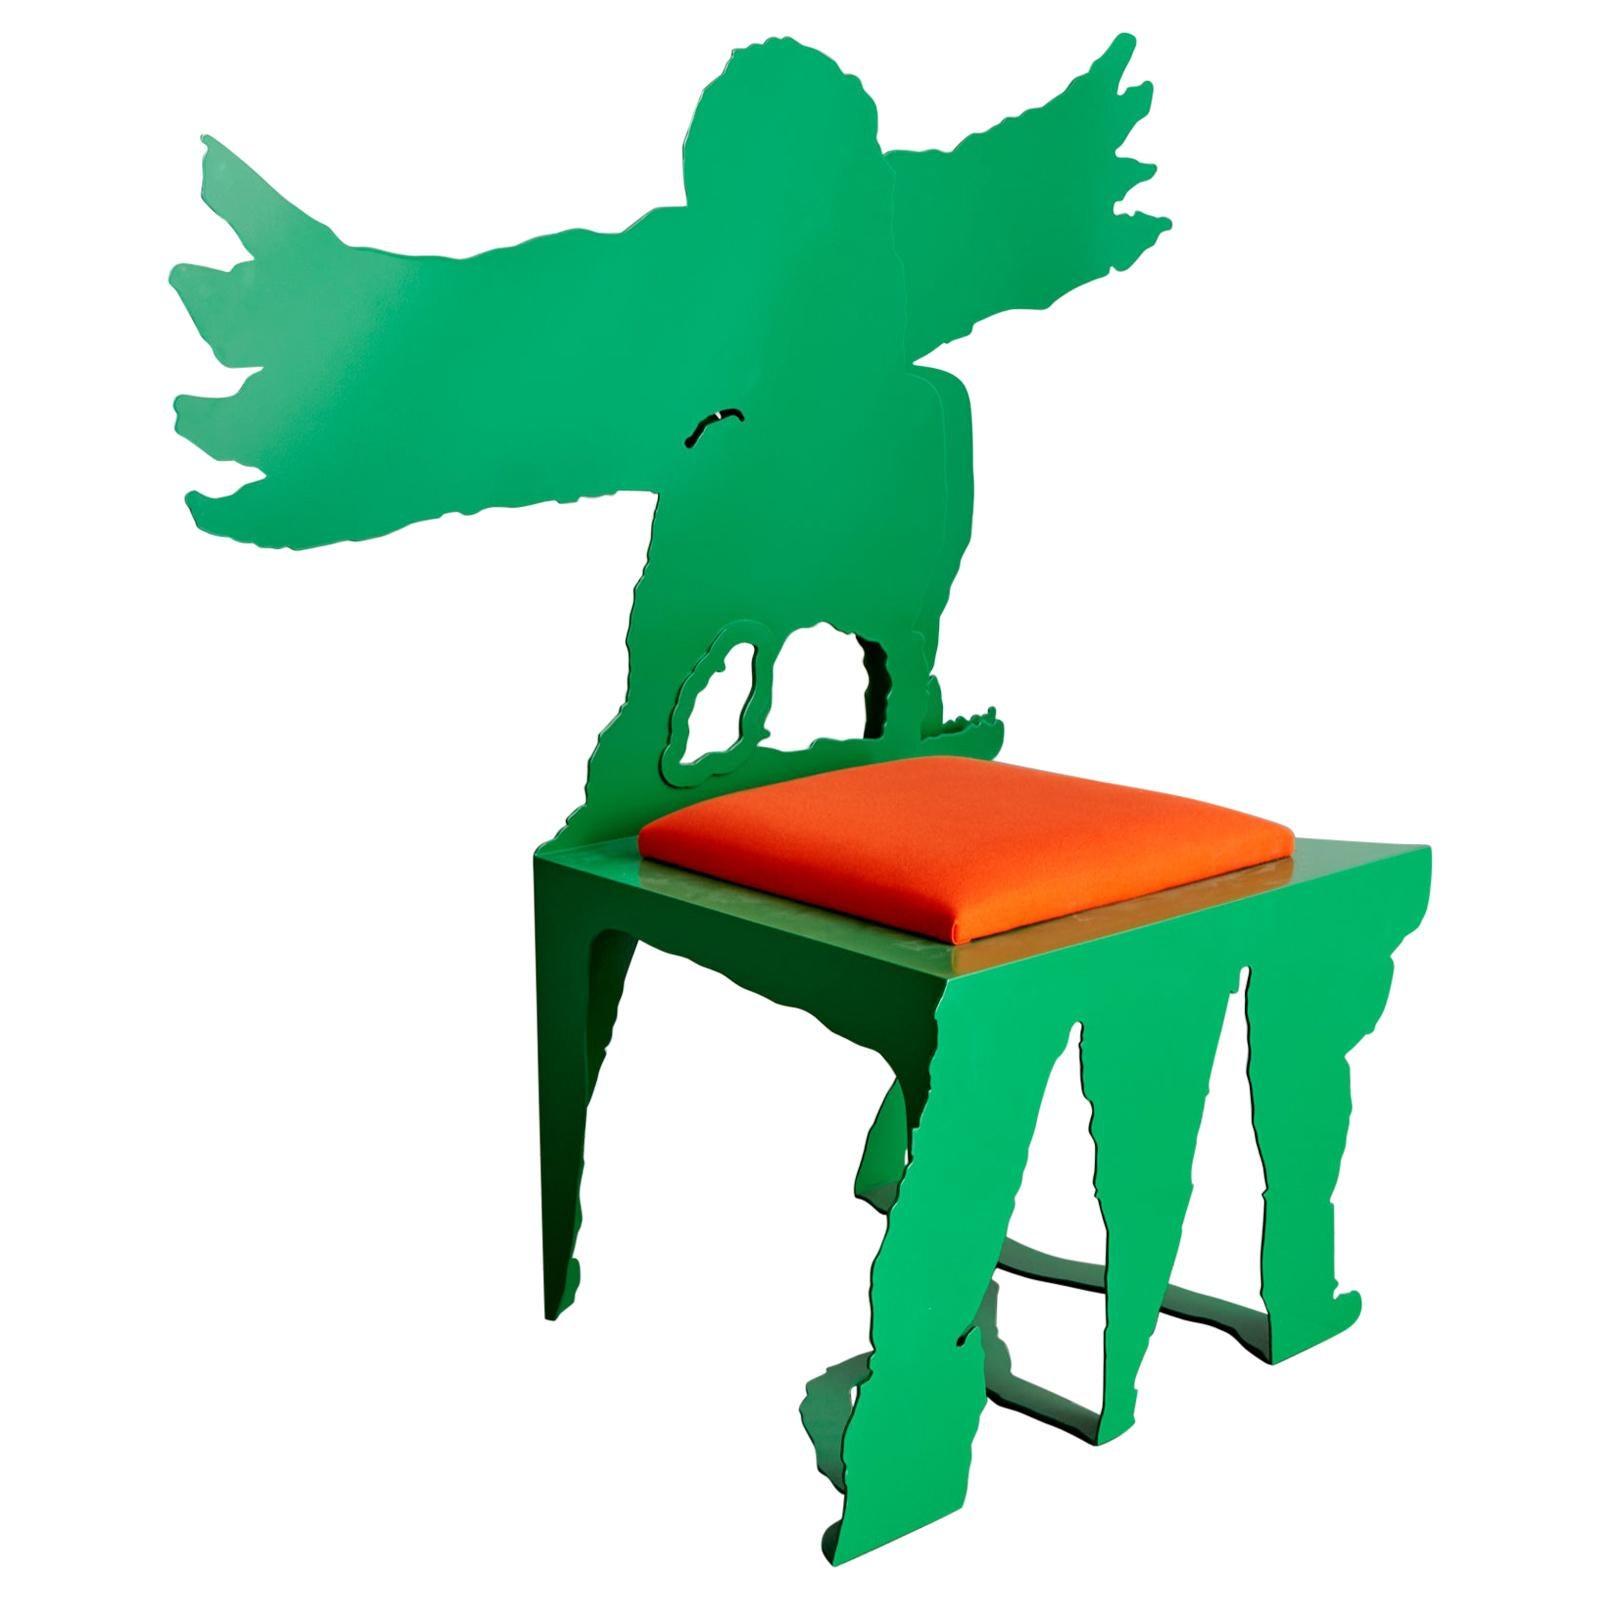 """Hugs #2"" Sculptural Chair by Serban Ionescu, 2018"